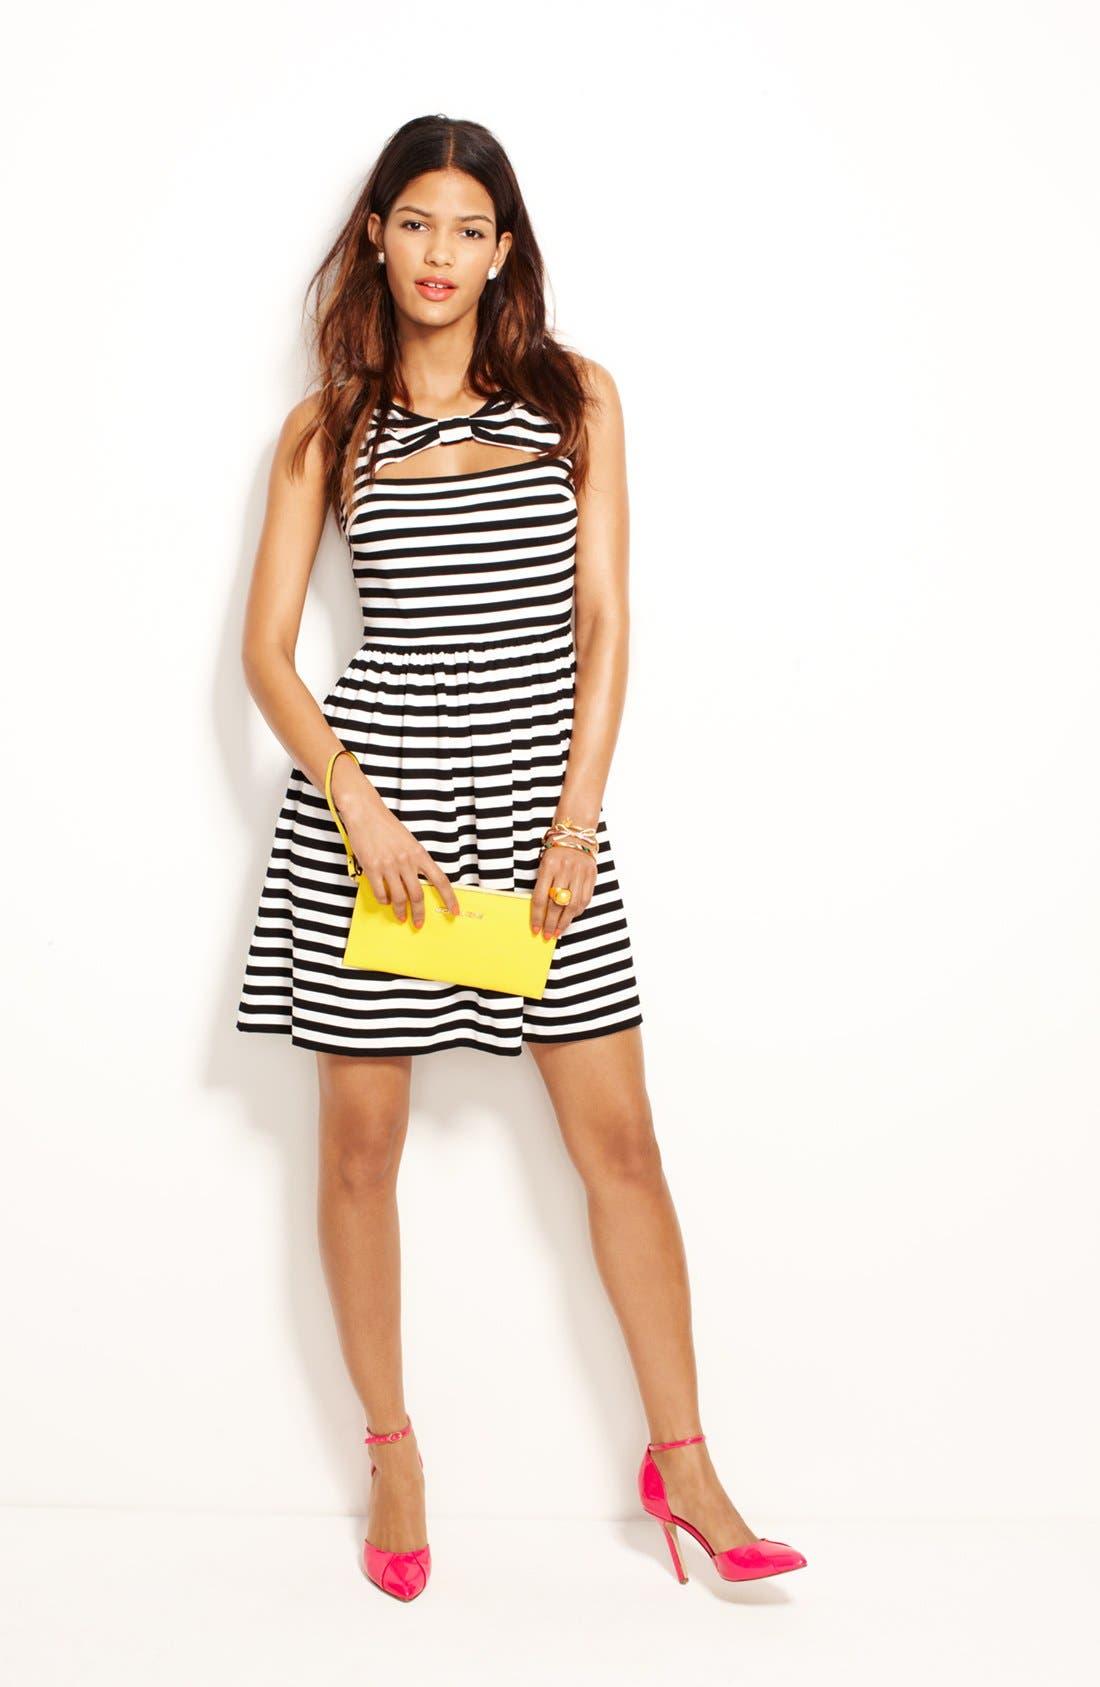 Main Image - Betsey Johnson Dress & Accessories